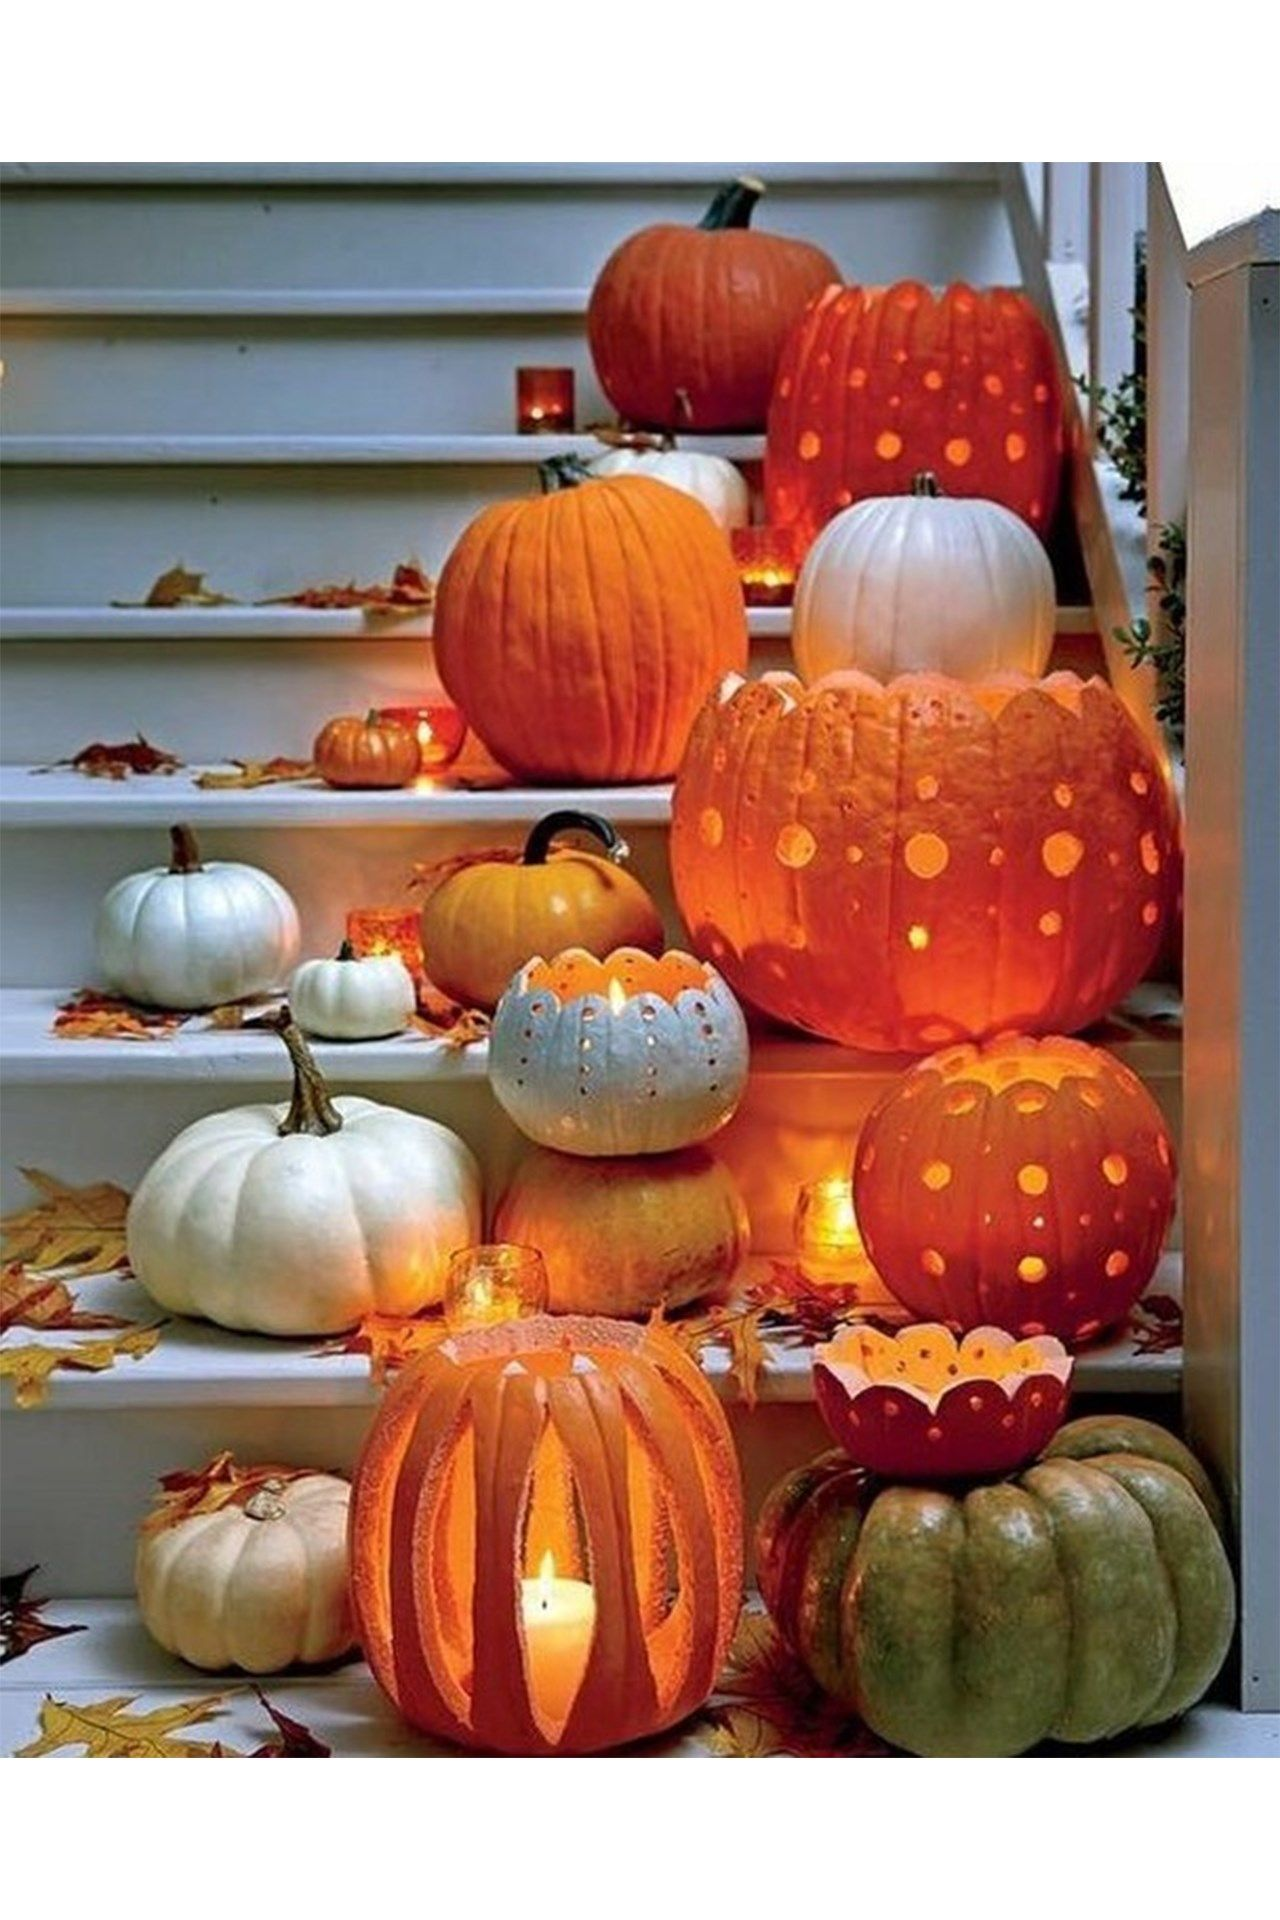 Wedding Ideas, Planning & Inspiration Pumpkin carving